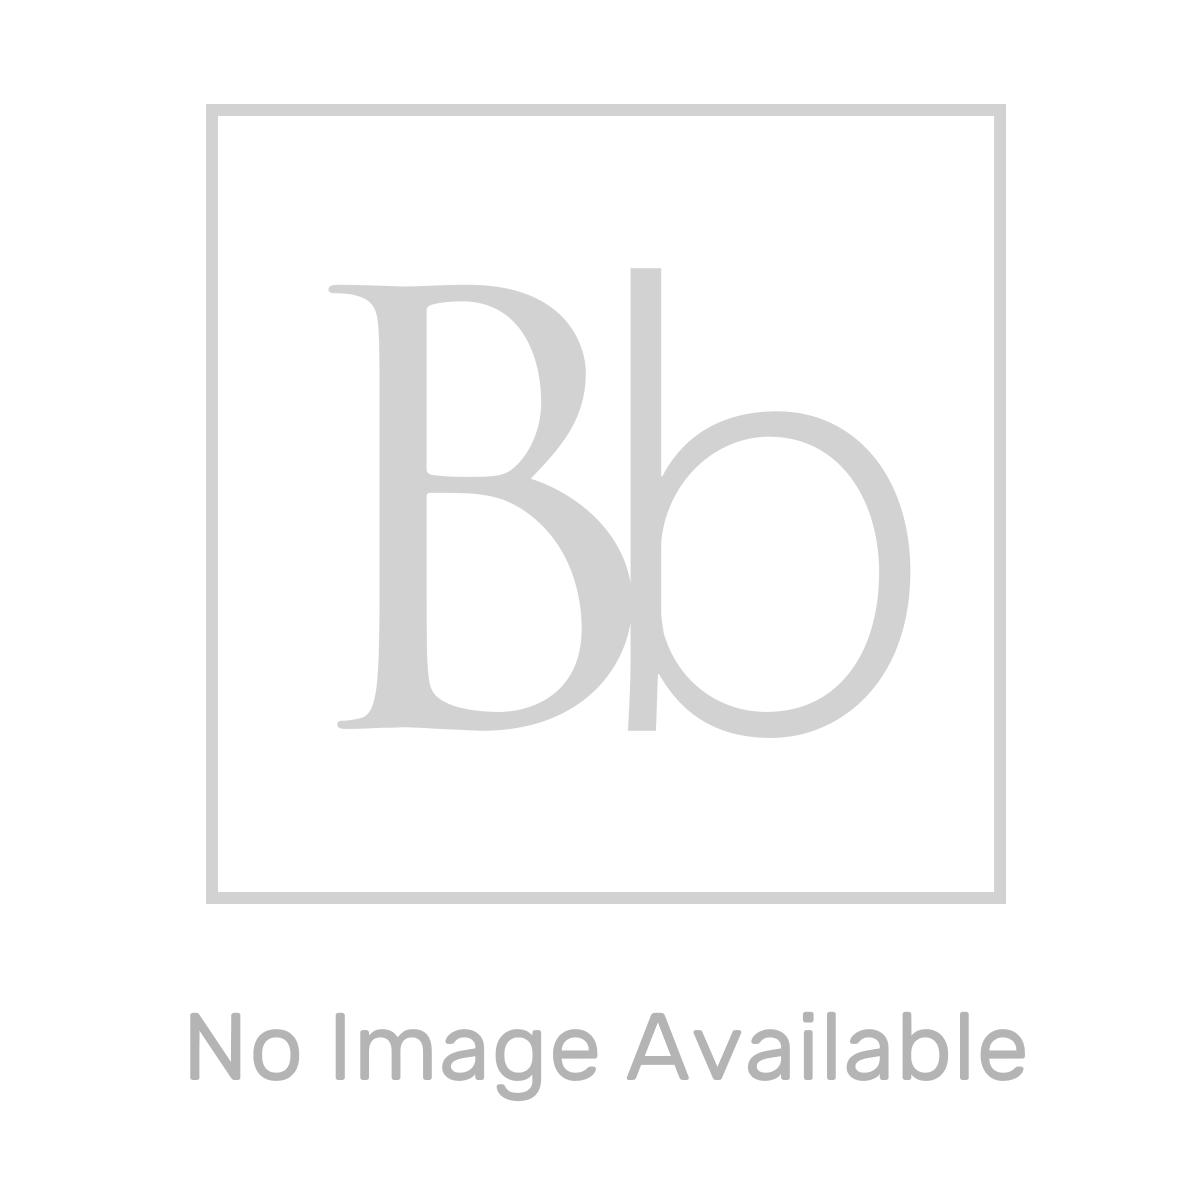 Nymas Stainless Steel Dark Blue Grab Rail